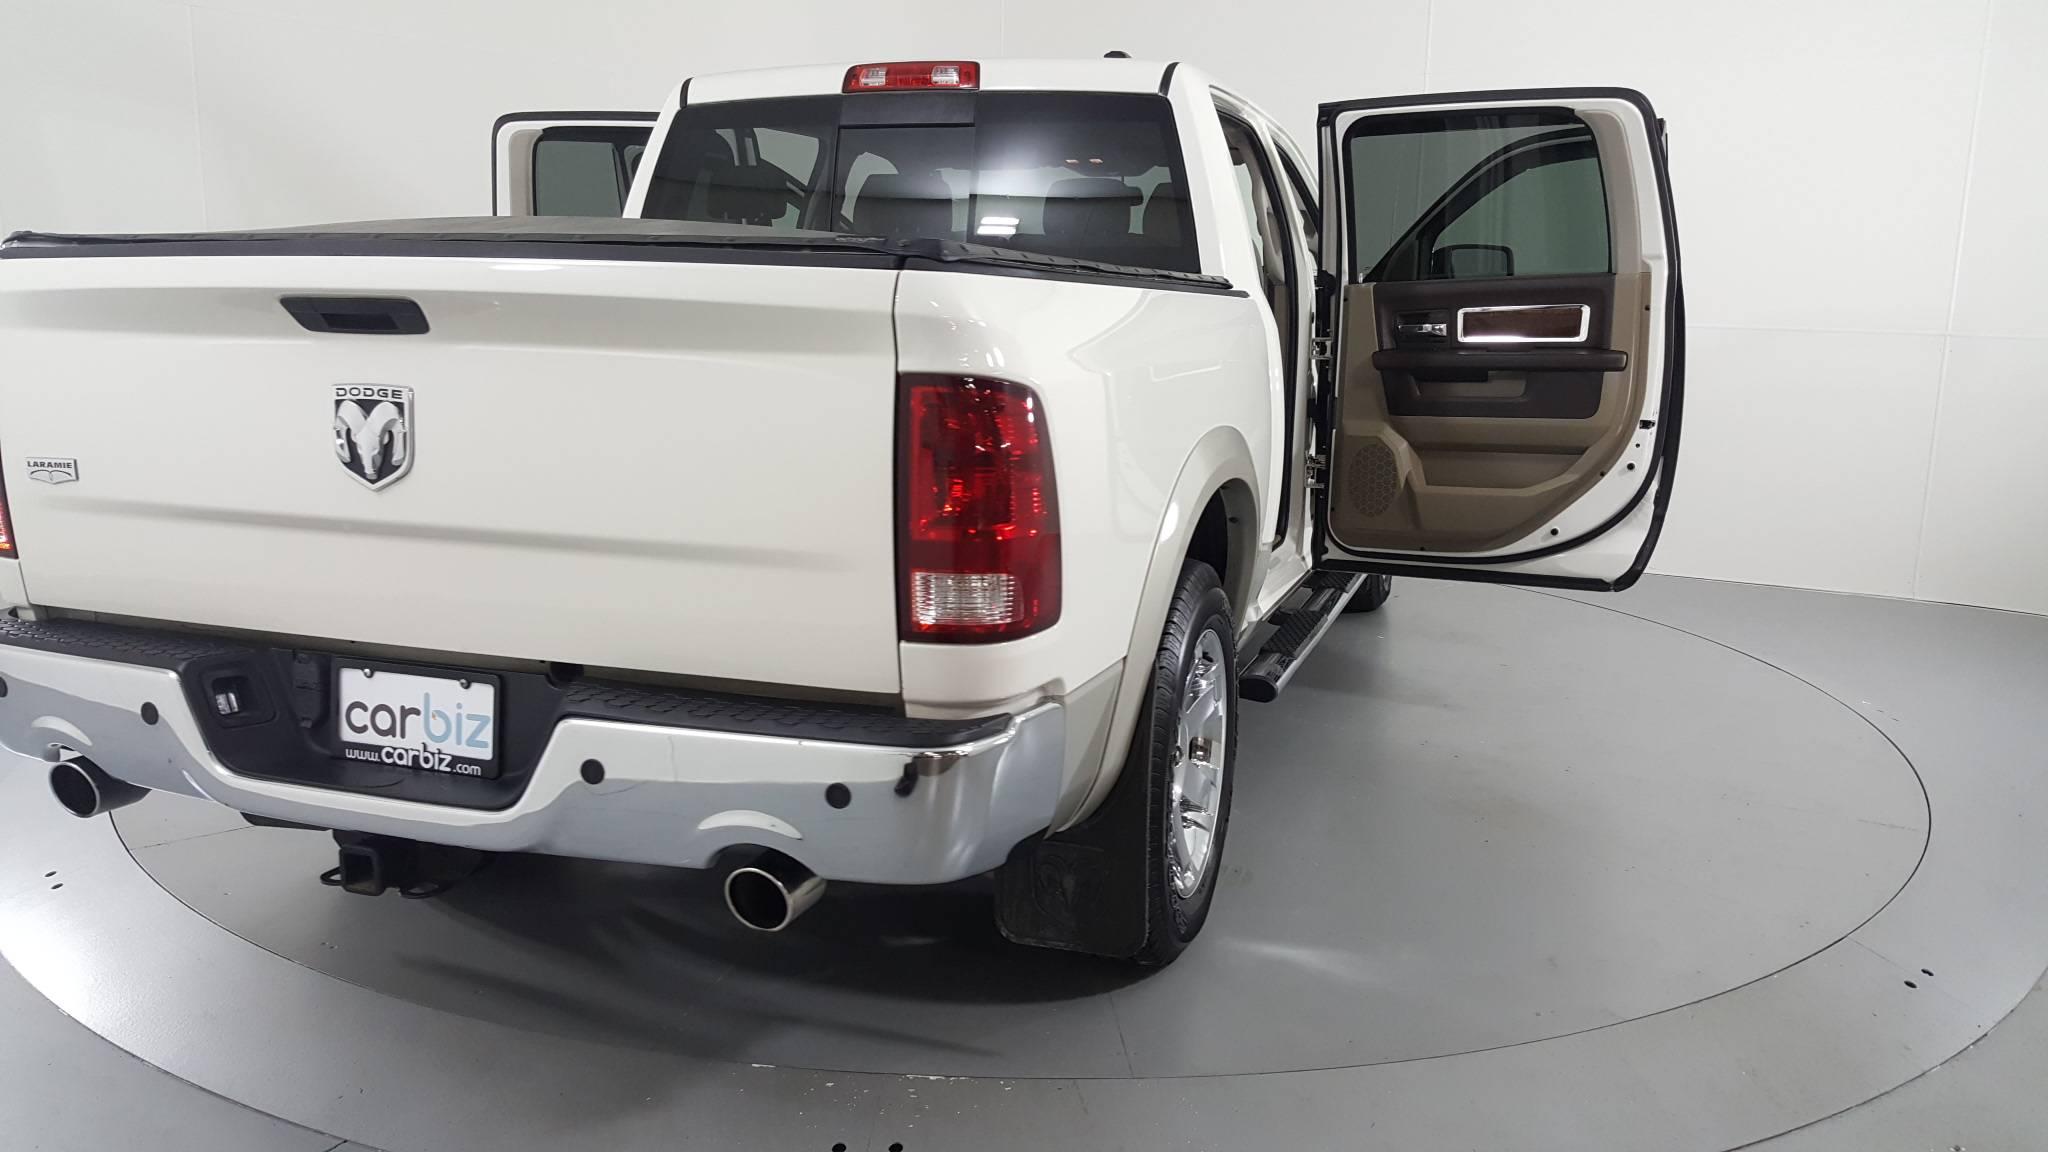 Pre-Owned 2009 Dodge Ram 1500 Laramie